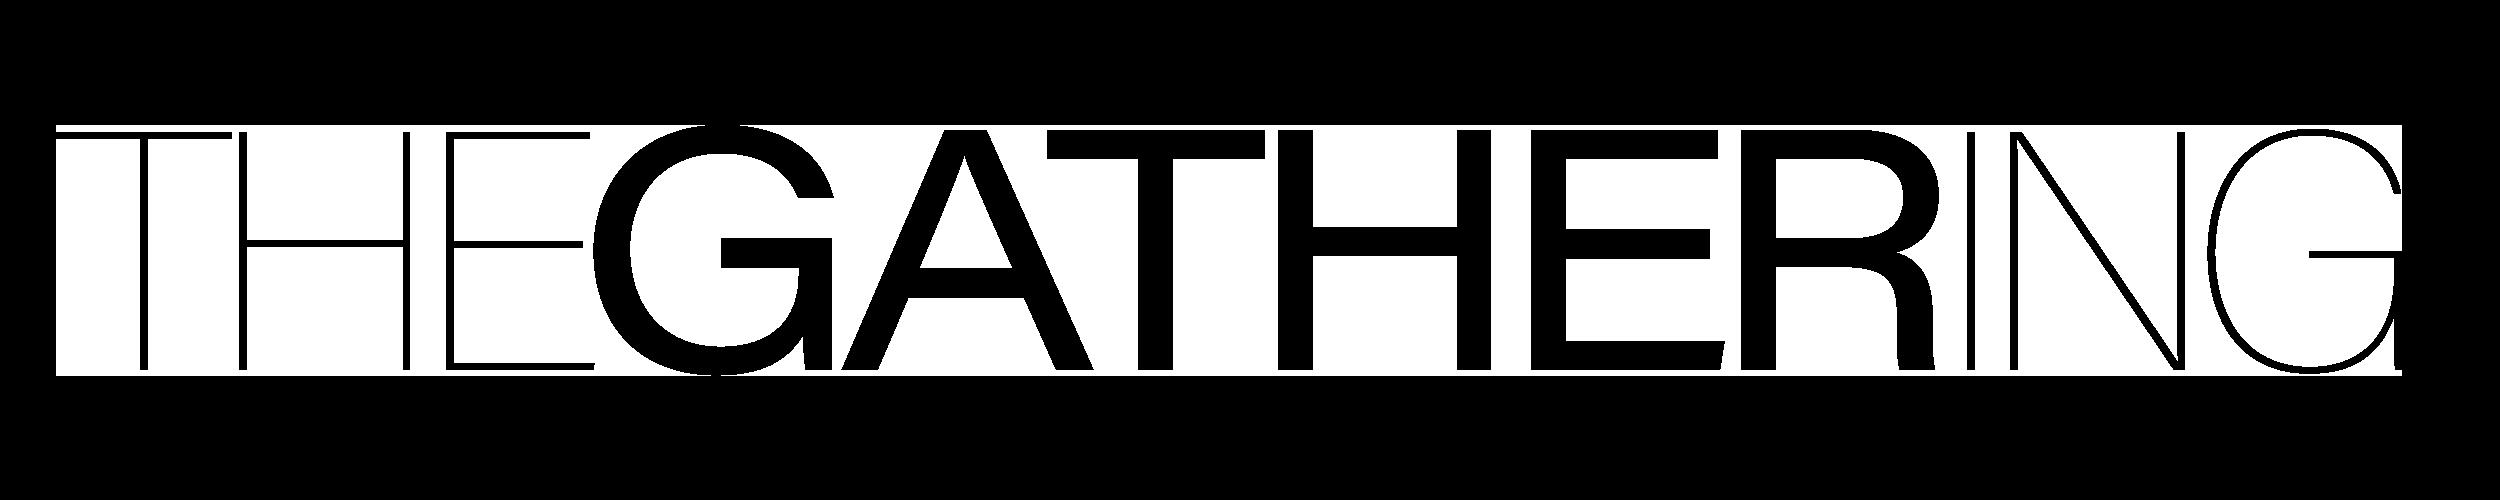 TheGathering-black.PNG